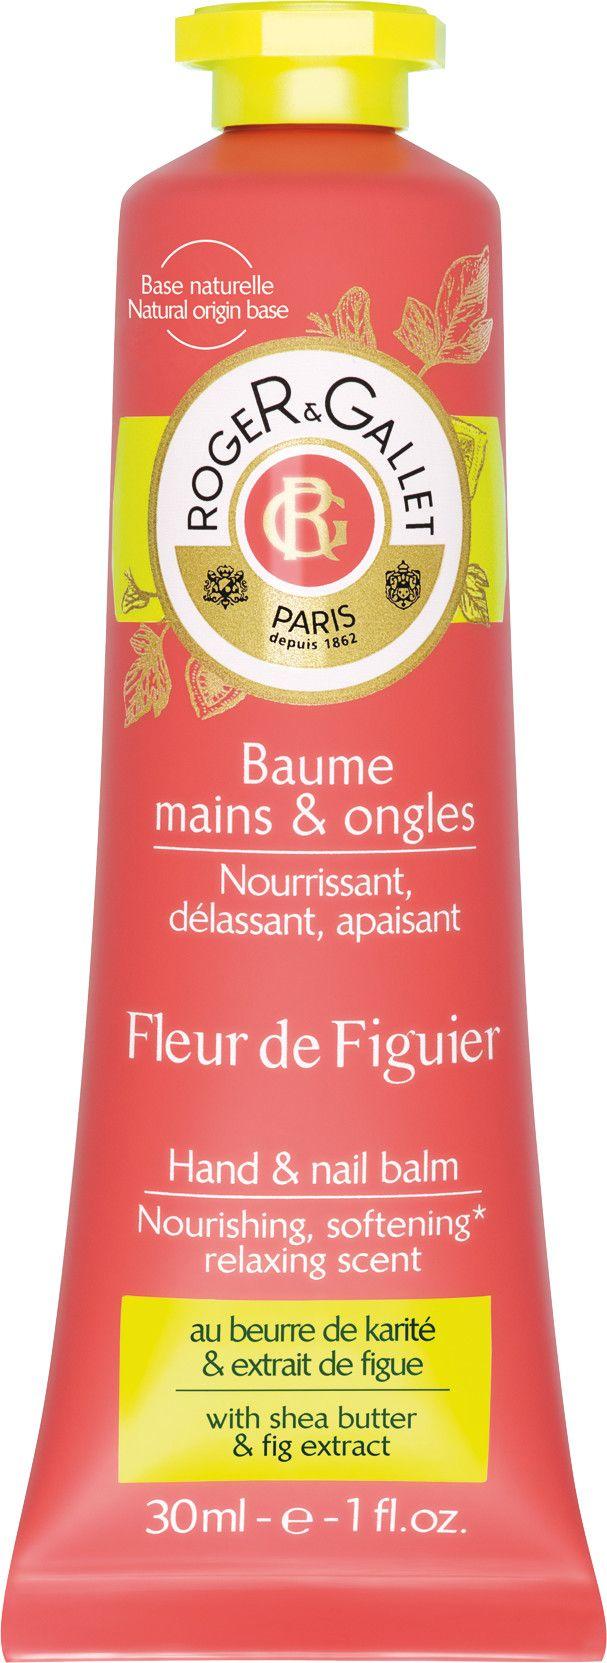 Roger & Gallet Fleur de Figuier Hand & Nail Balm 30ml